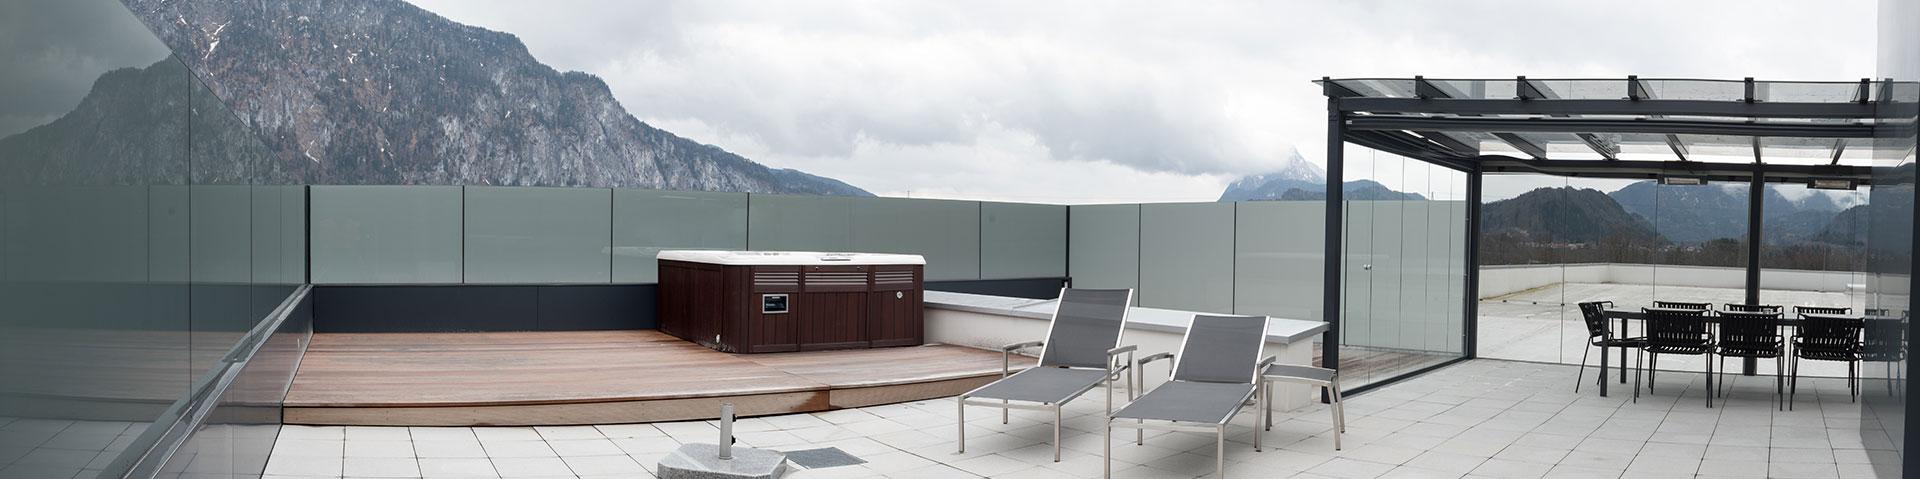 B&W Glasbau Glasdach Dach Teilvorgespanntenglas Windschutz